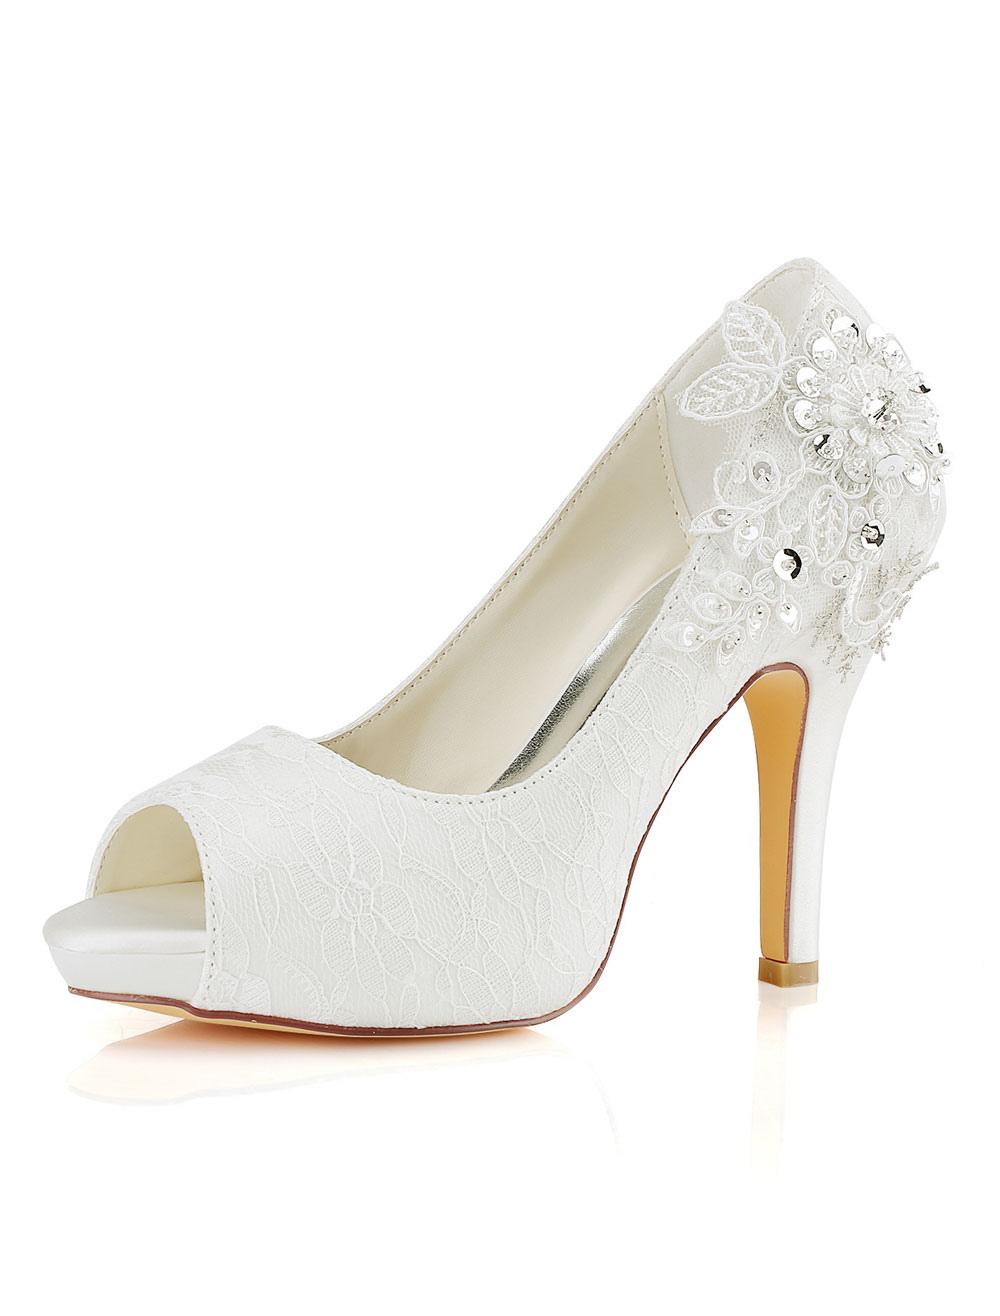 Lace Wedding Shoes Ivory Lace Peep Toe High Heel Bridal Shoes